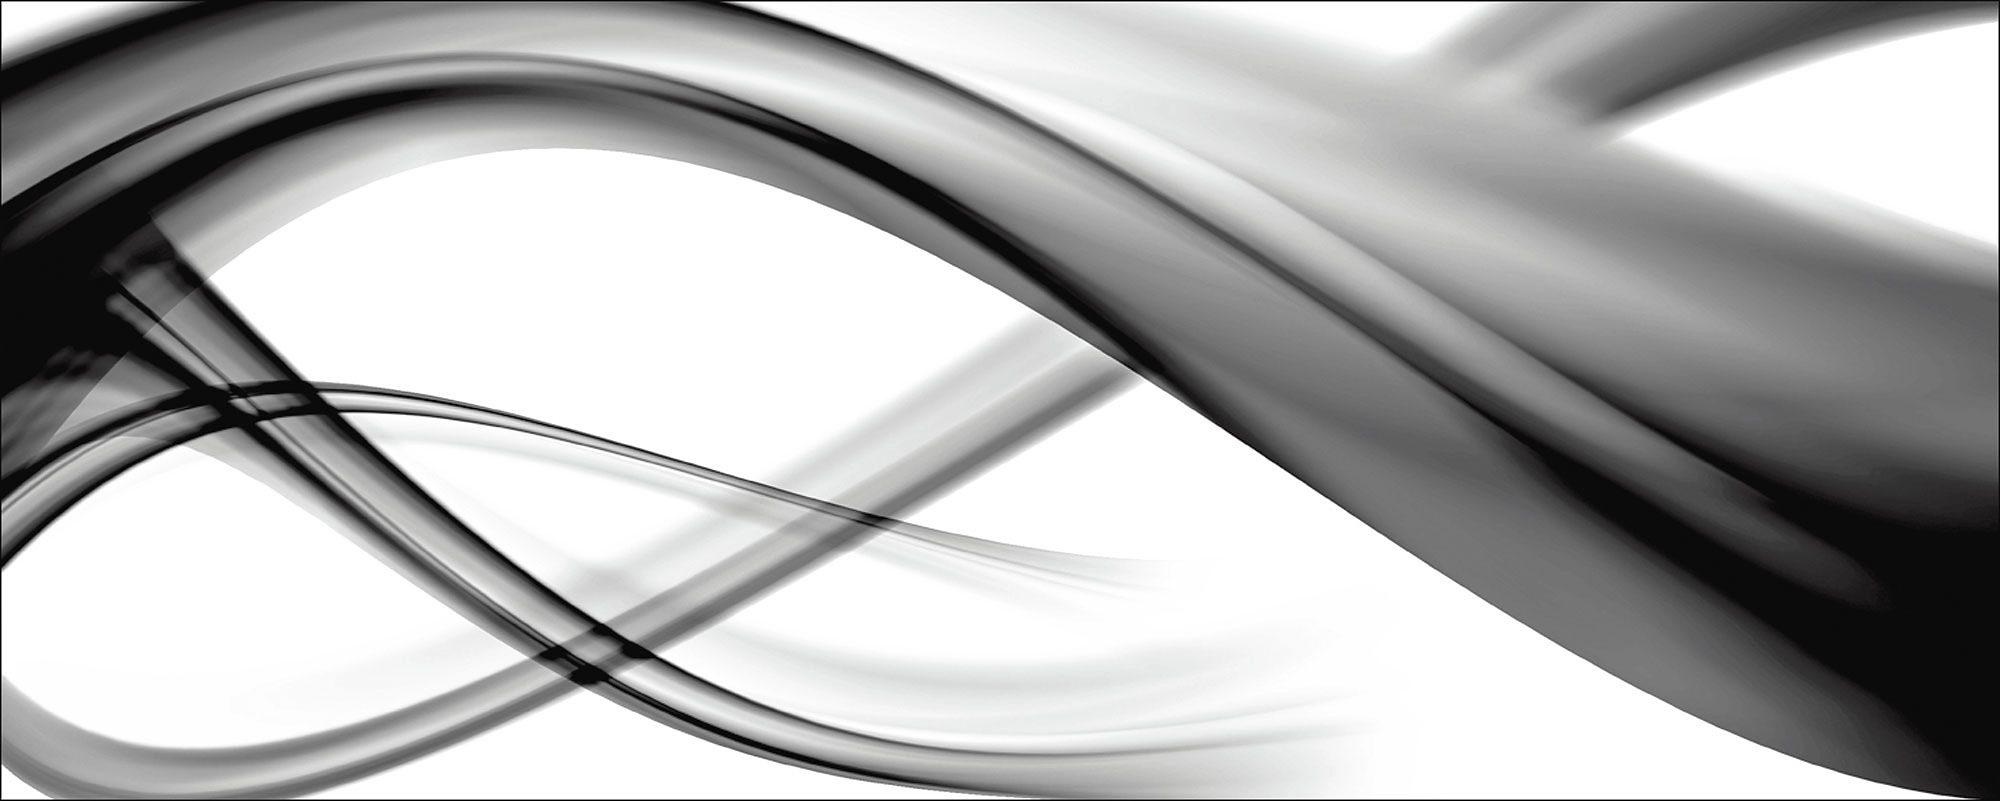 Glasbild, Home affaire, »B. Bocos: Abstrakte Komposition (s/w)«, 125/50 cm